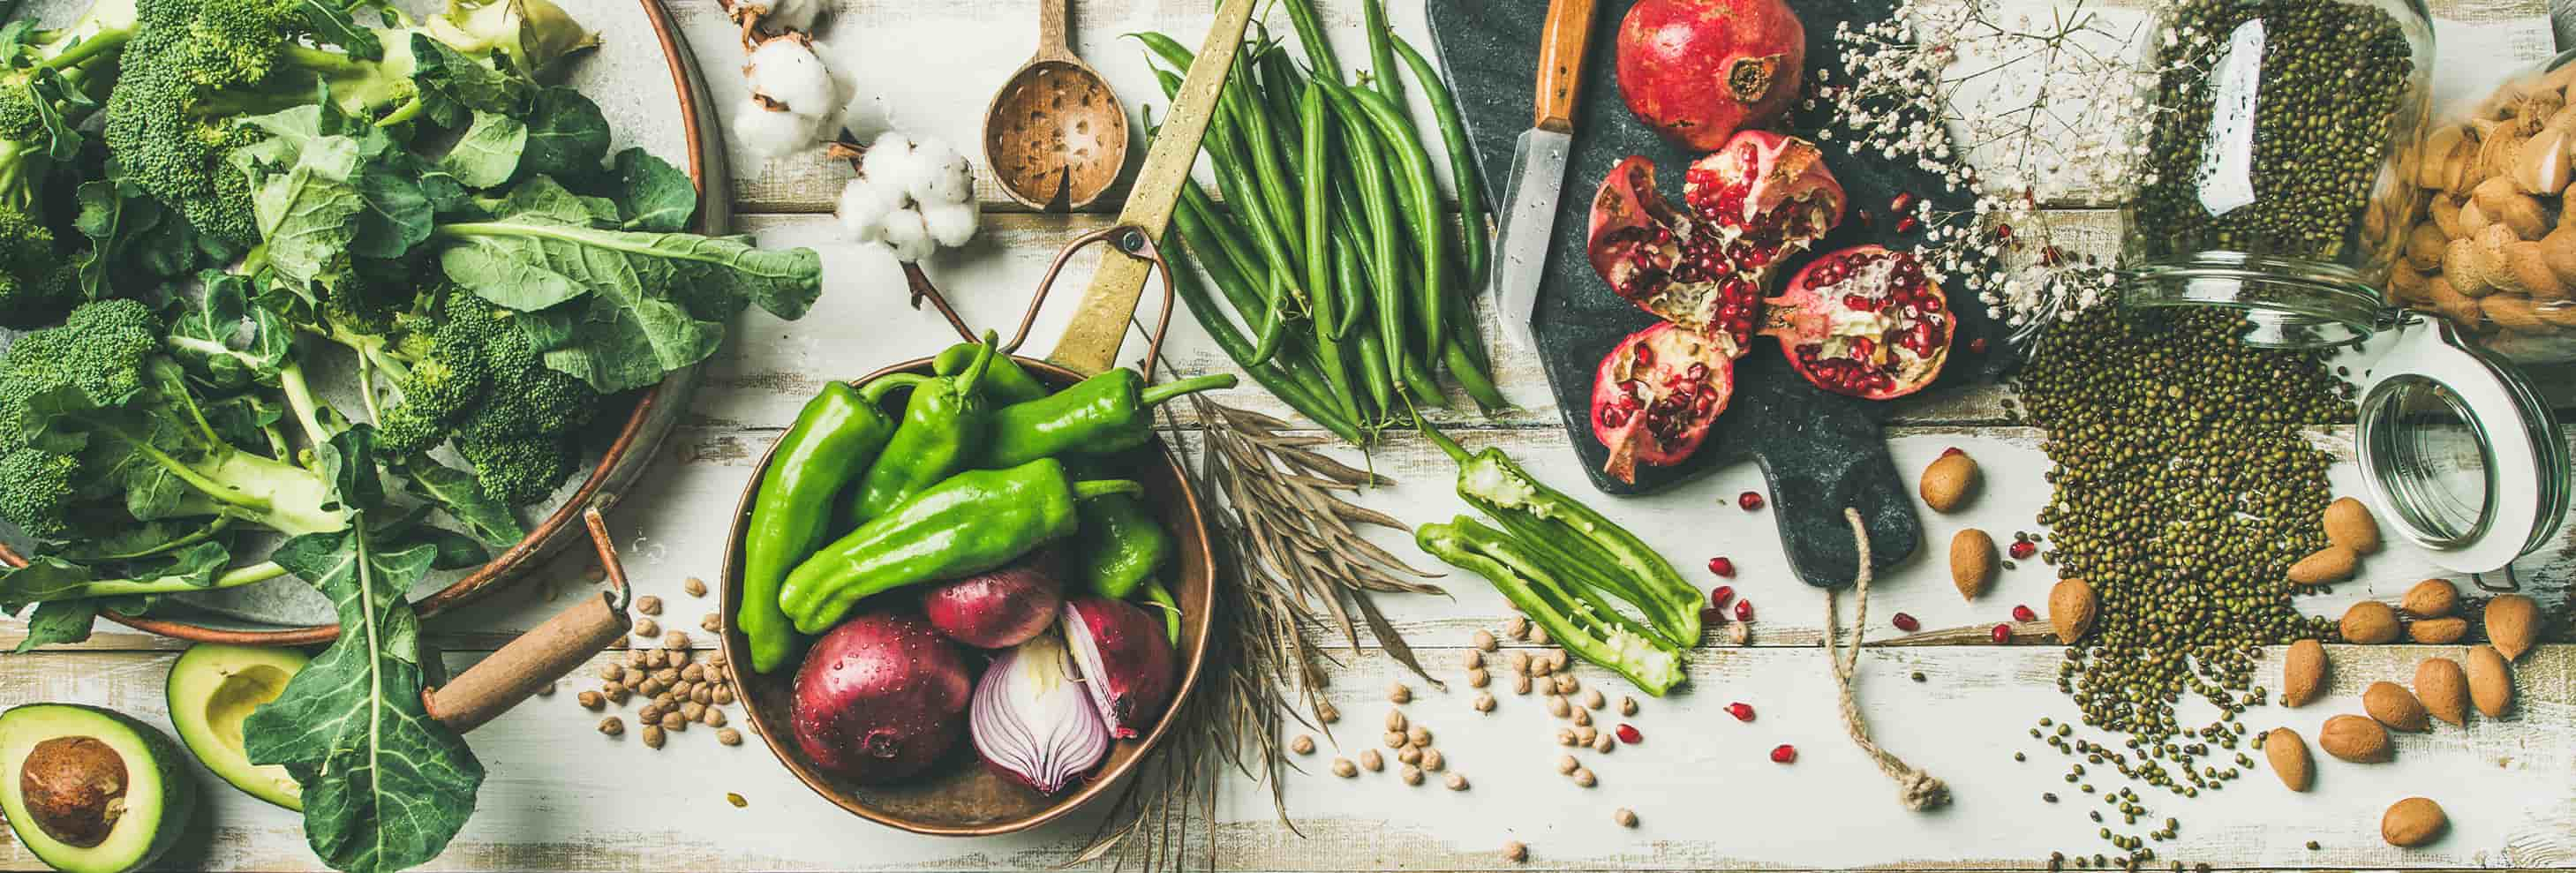 Spiritual_reasons_for_the_Vegetarian_Diet_banner